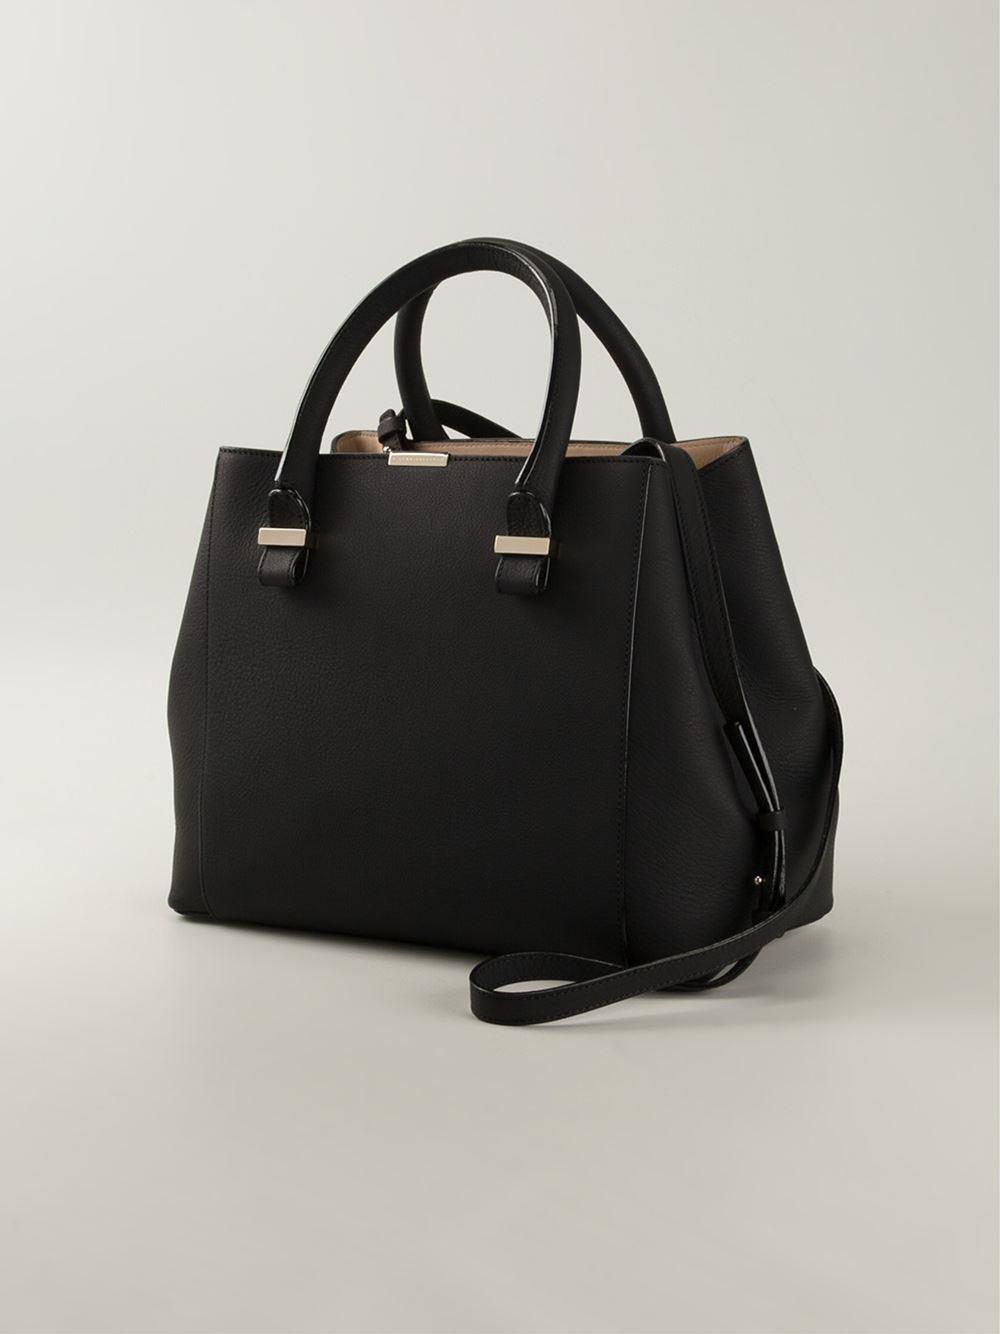 Victoria beckham 'quincy' Tote Bag in Black